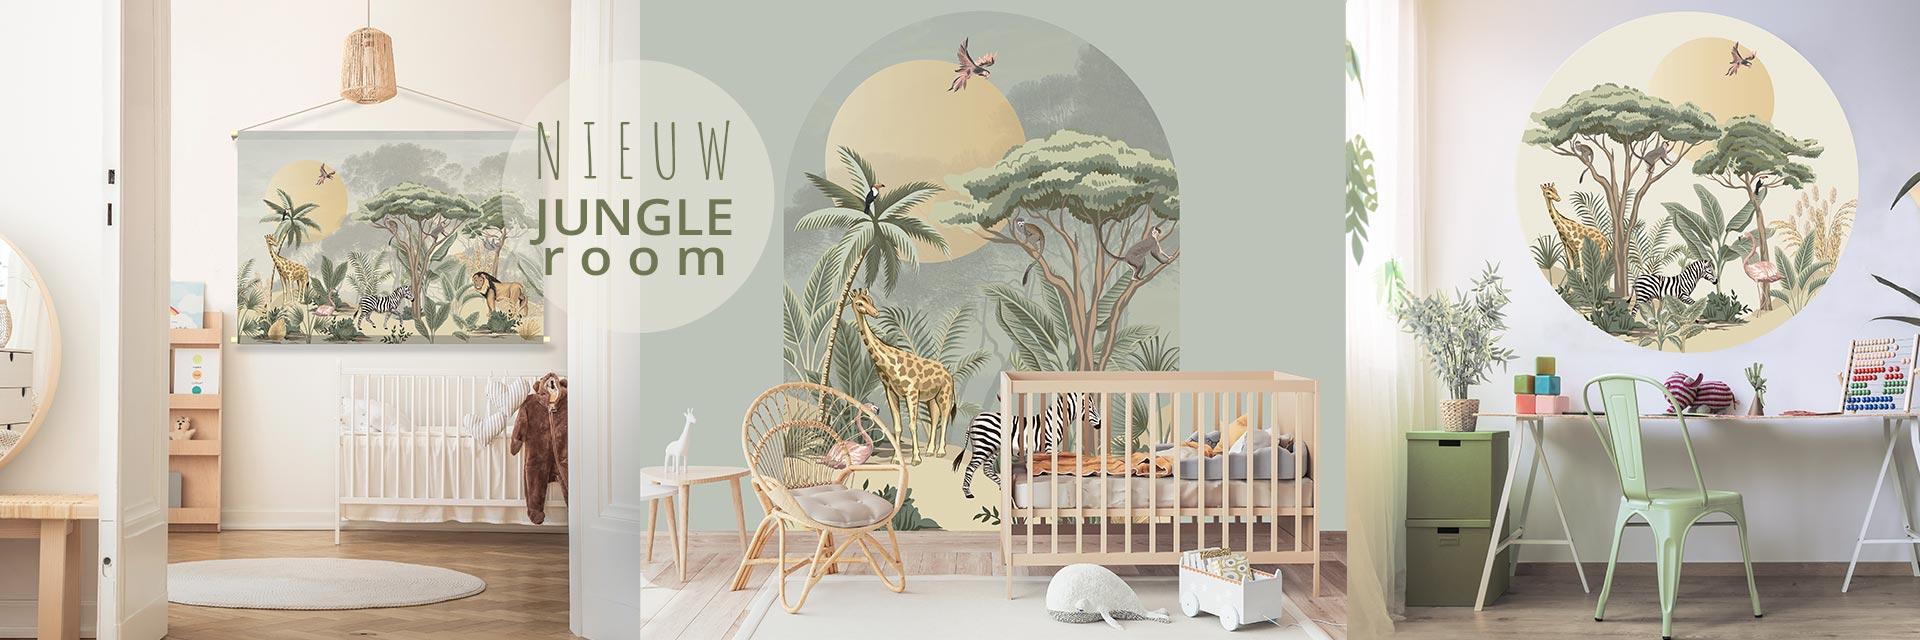 kinderkamer-jungle-room